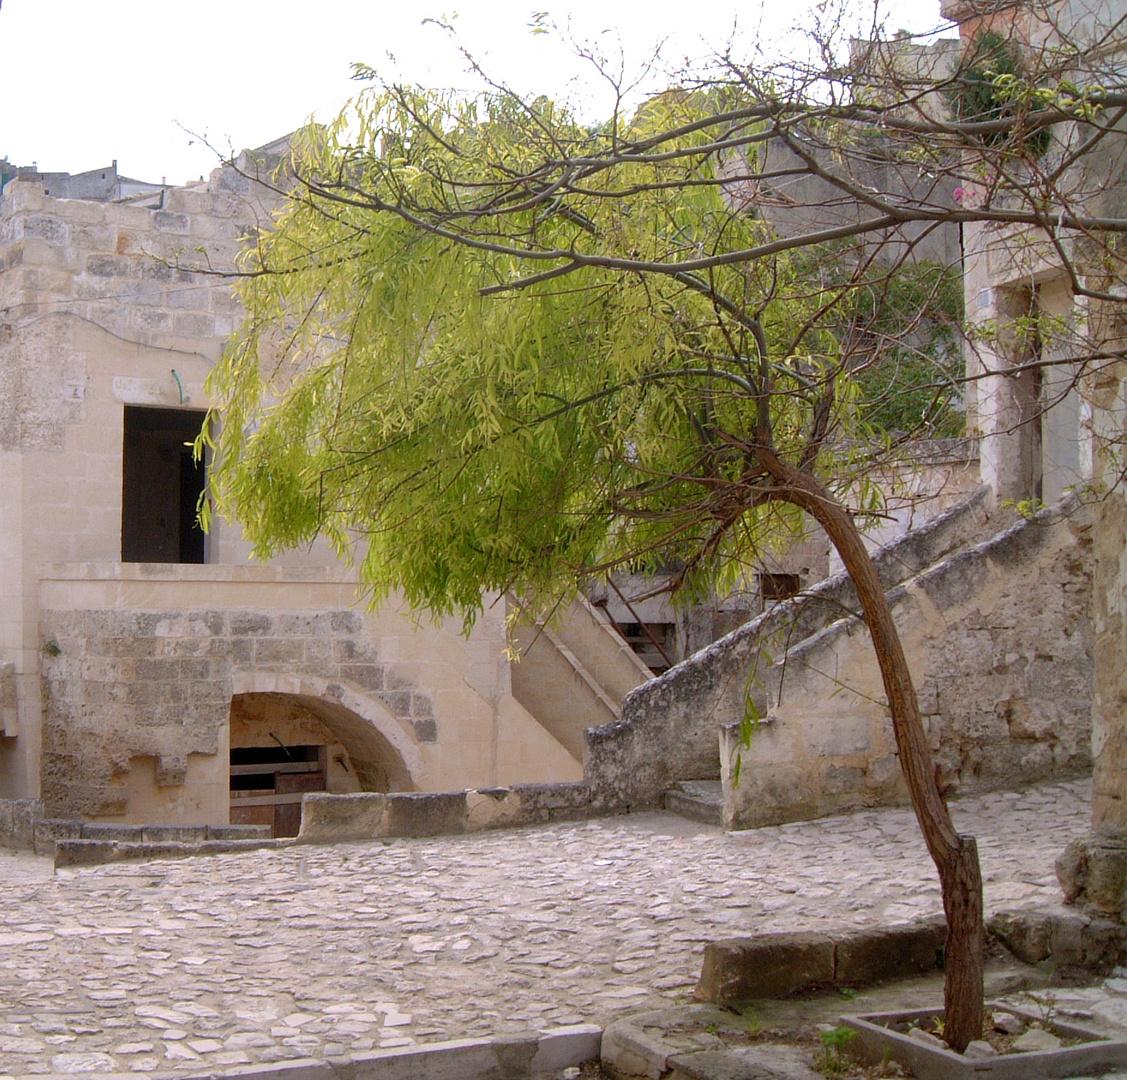 The Sassi Area of Matera